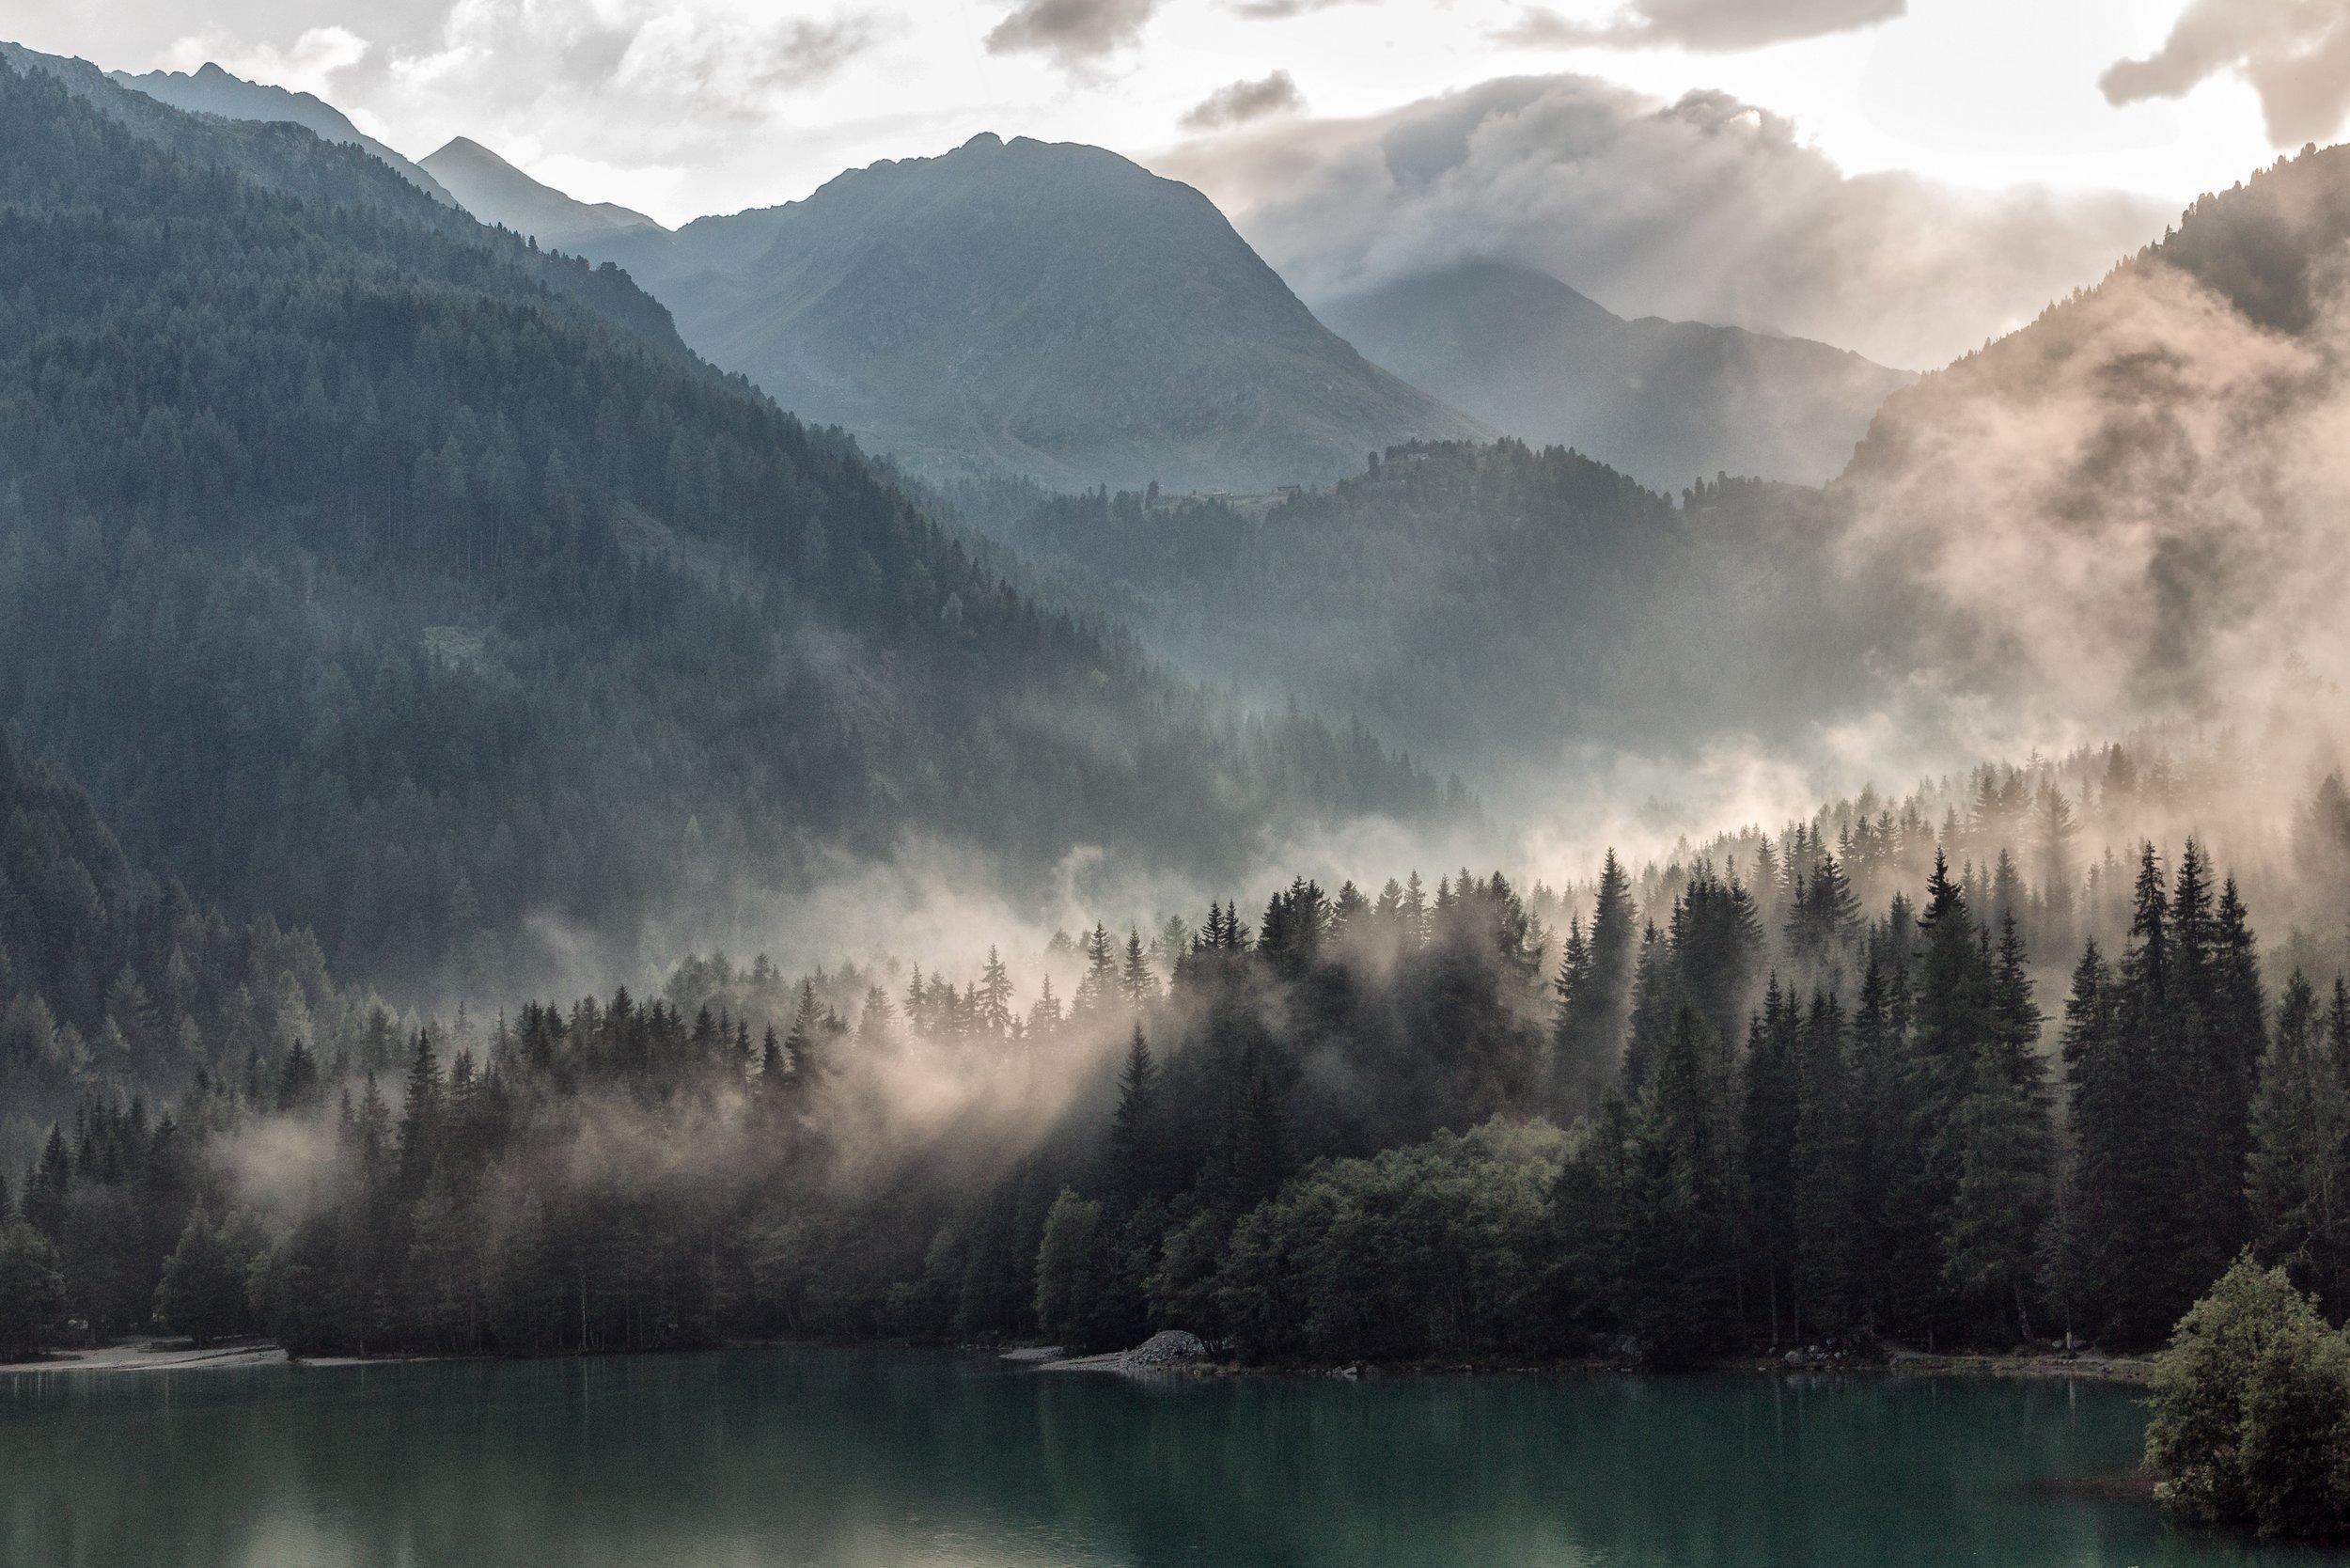 picography-morning-mist-tree-mountains-clouds-eberhard-grossgasteiger.jpg